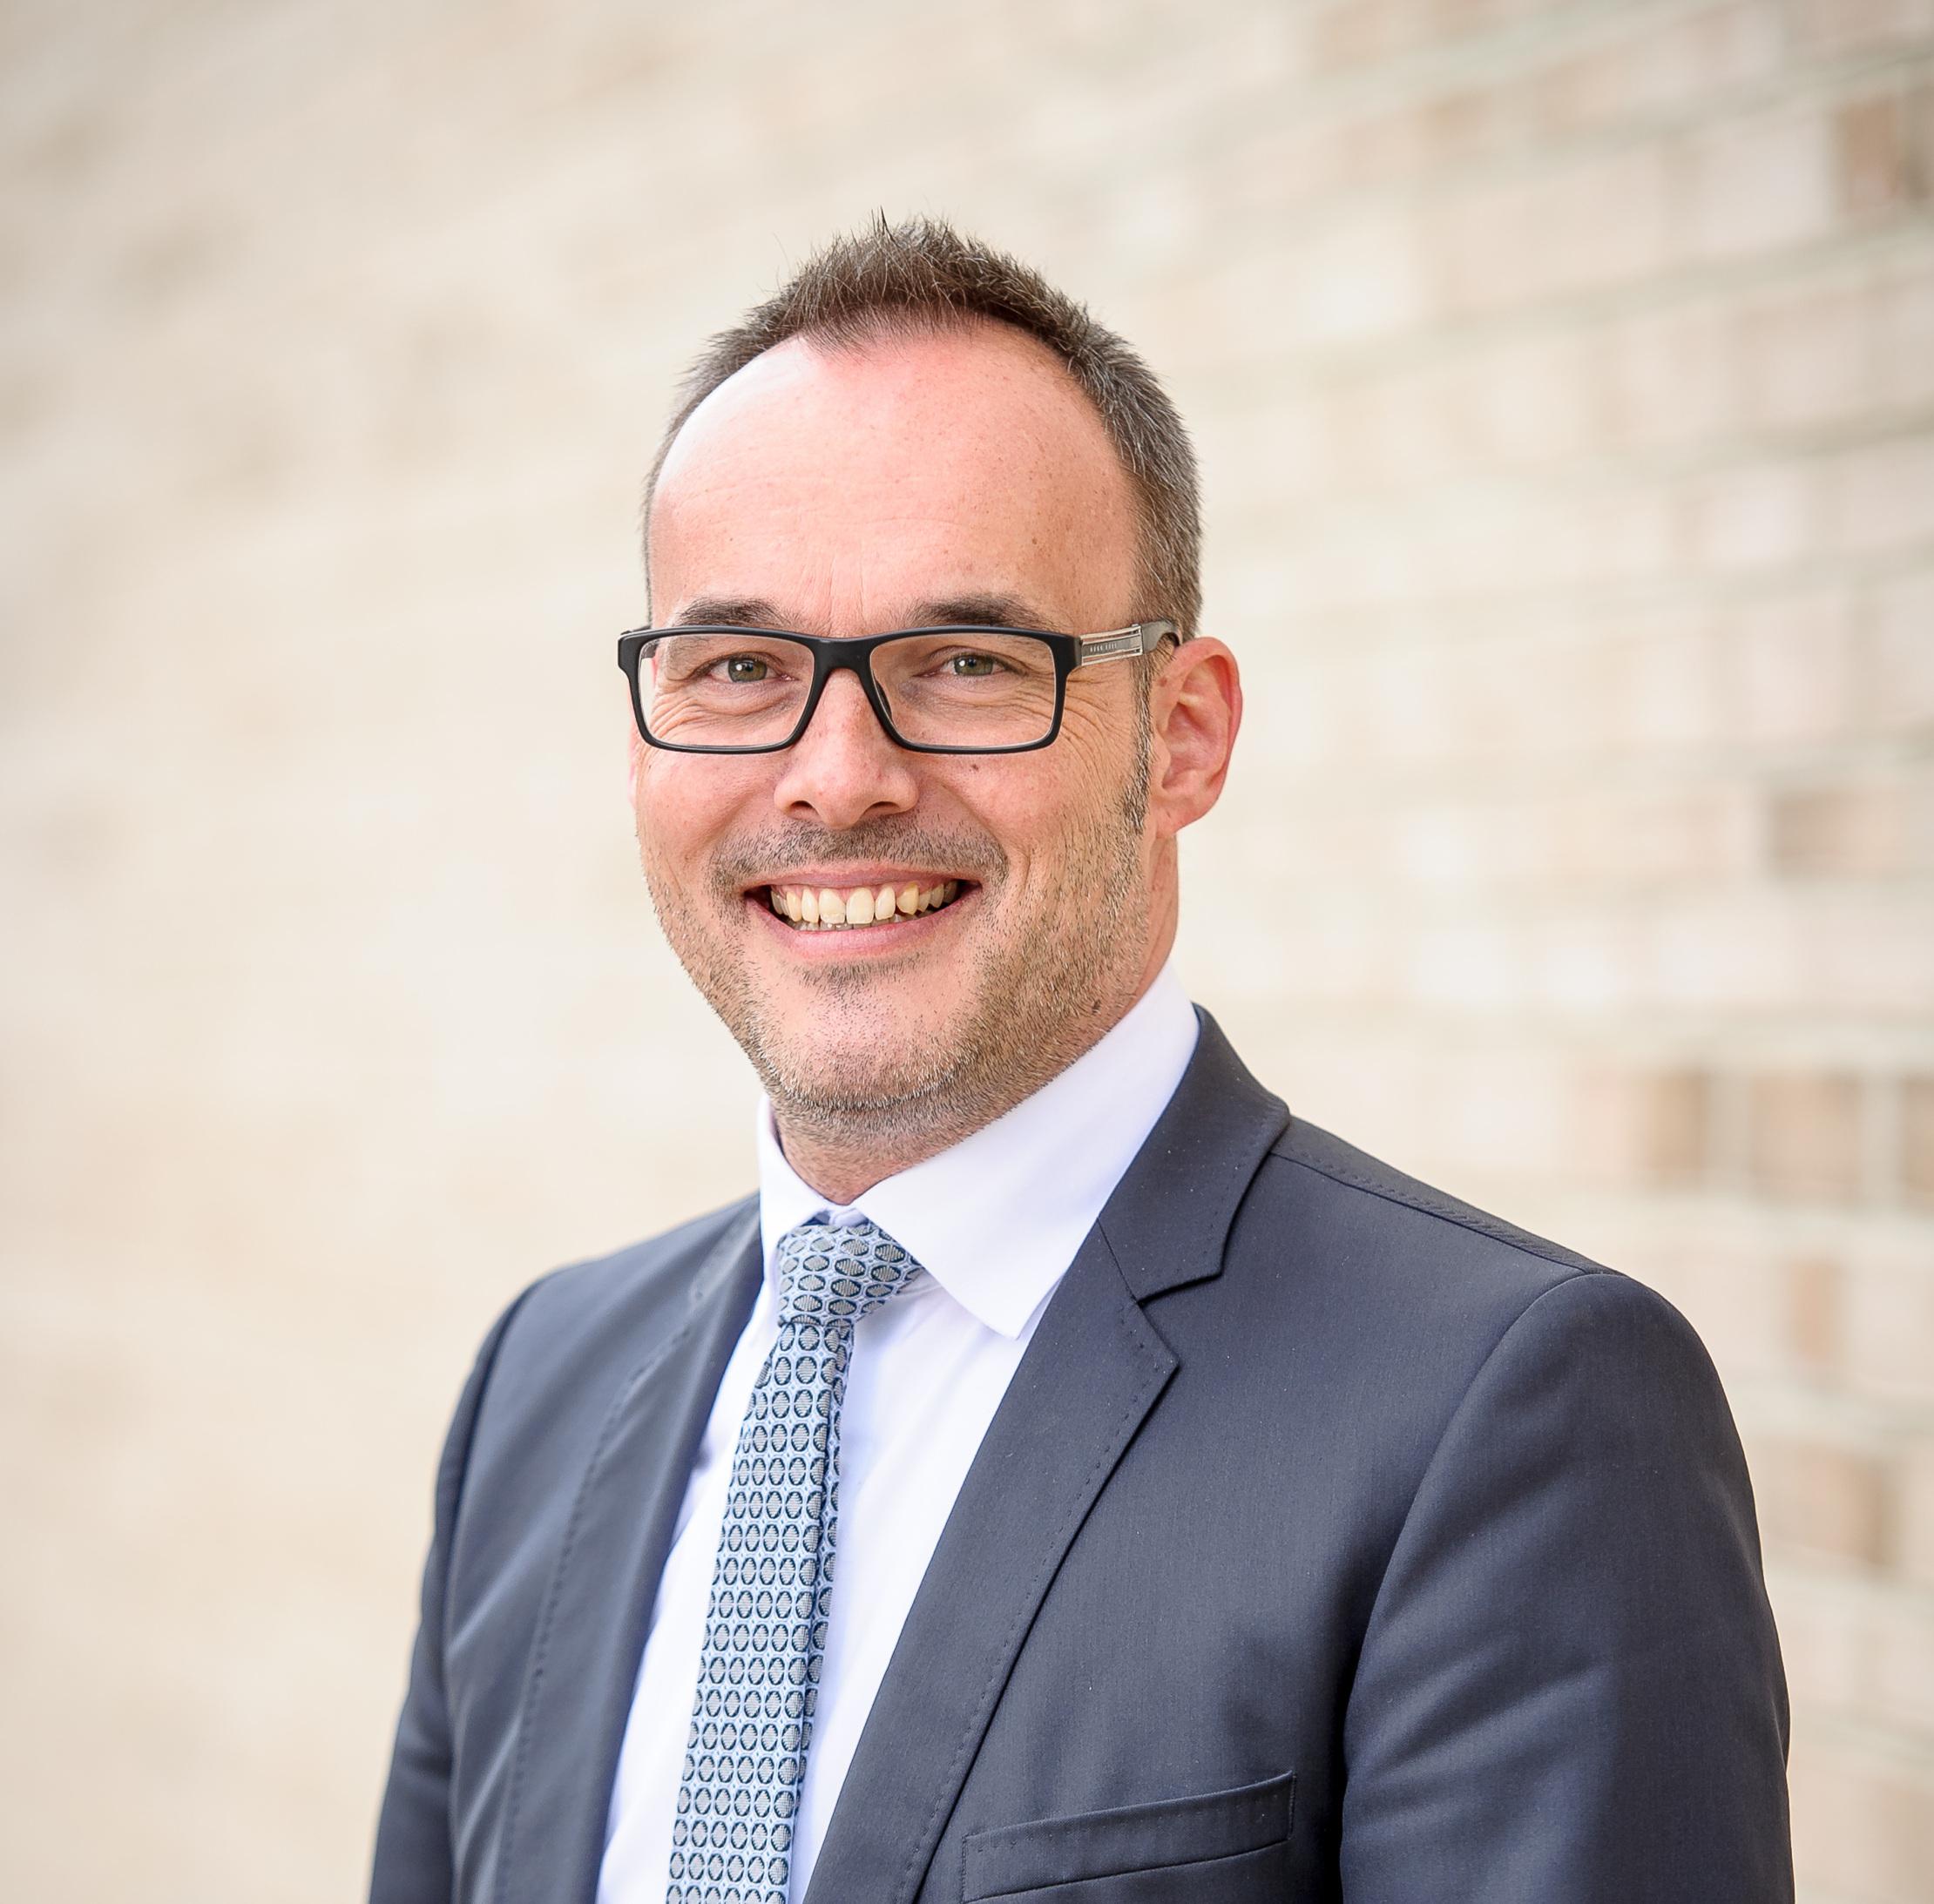 Rechtsanwalt Alexander Schneider